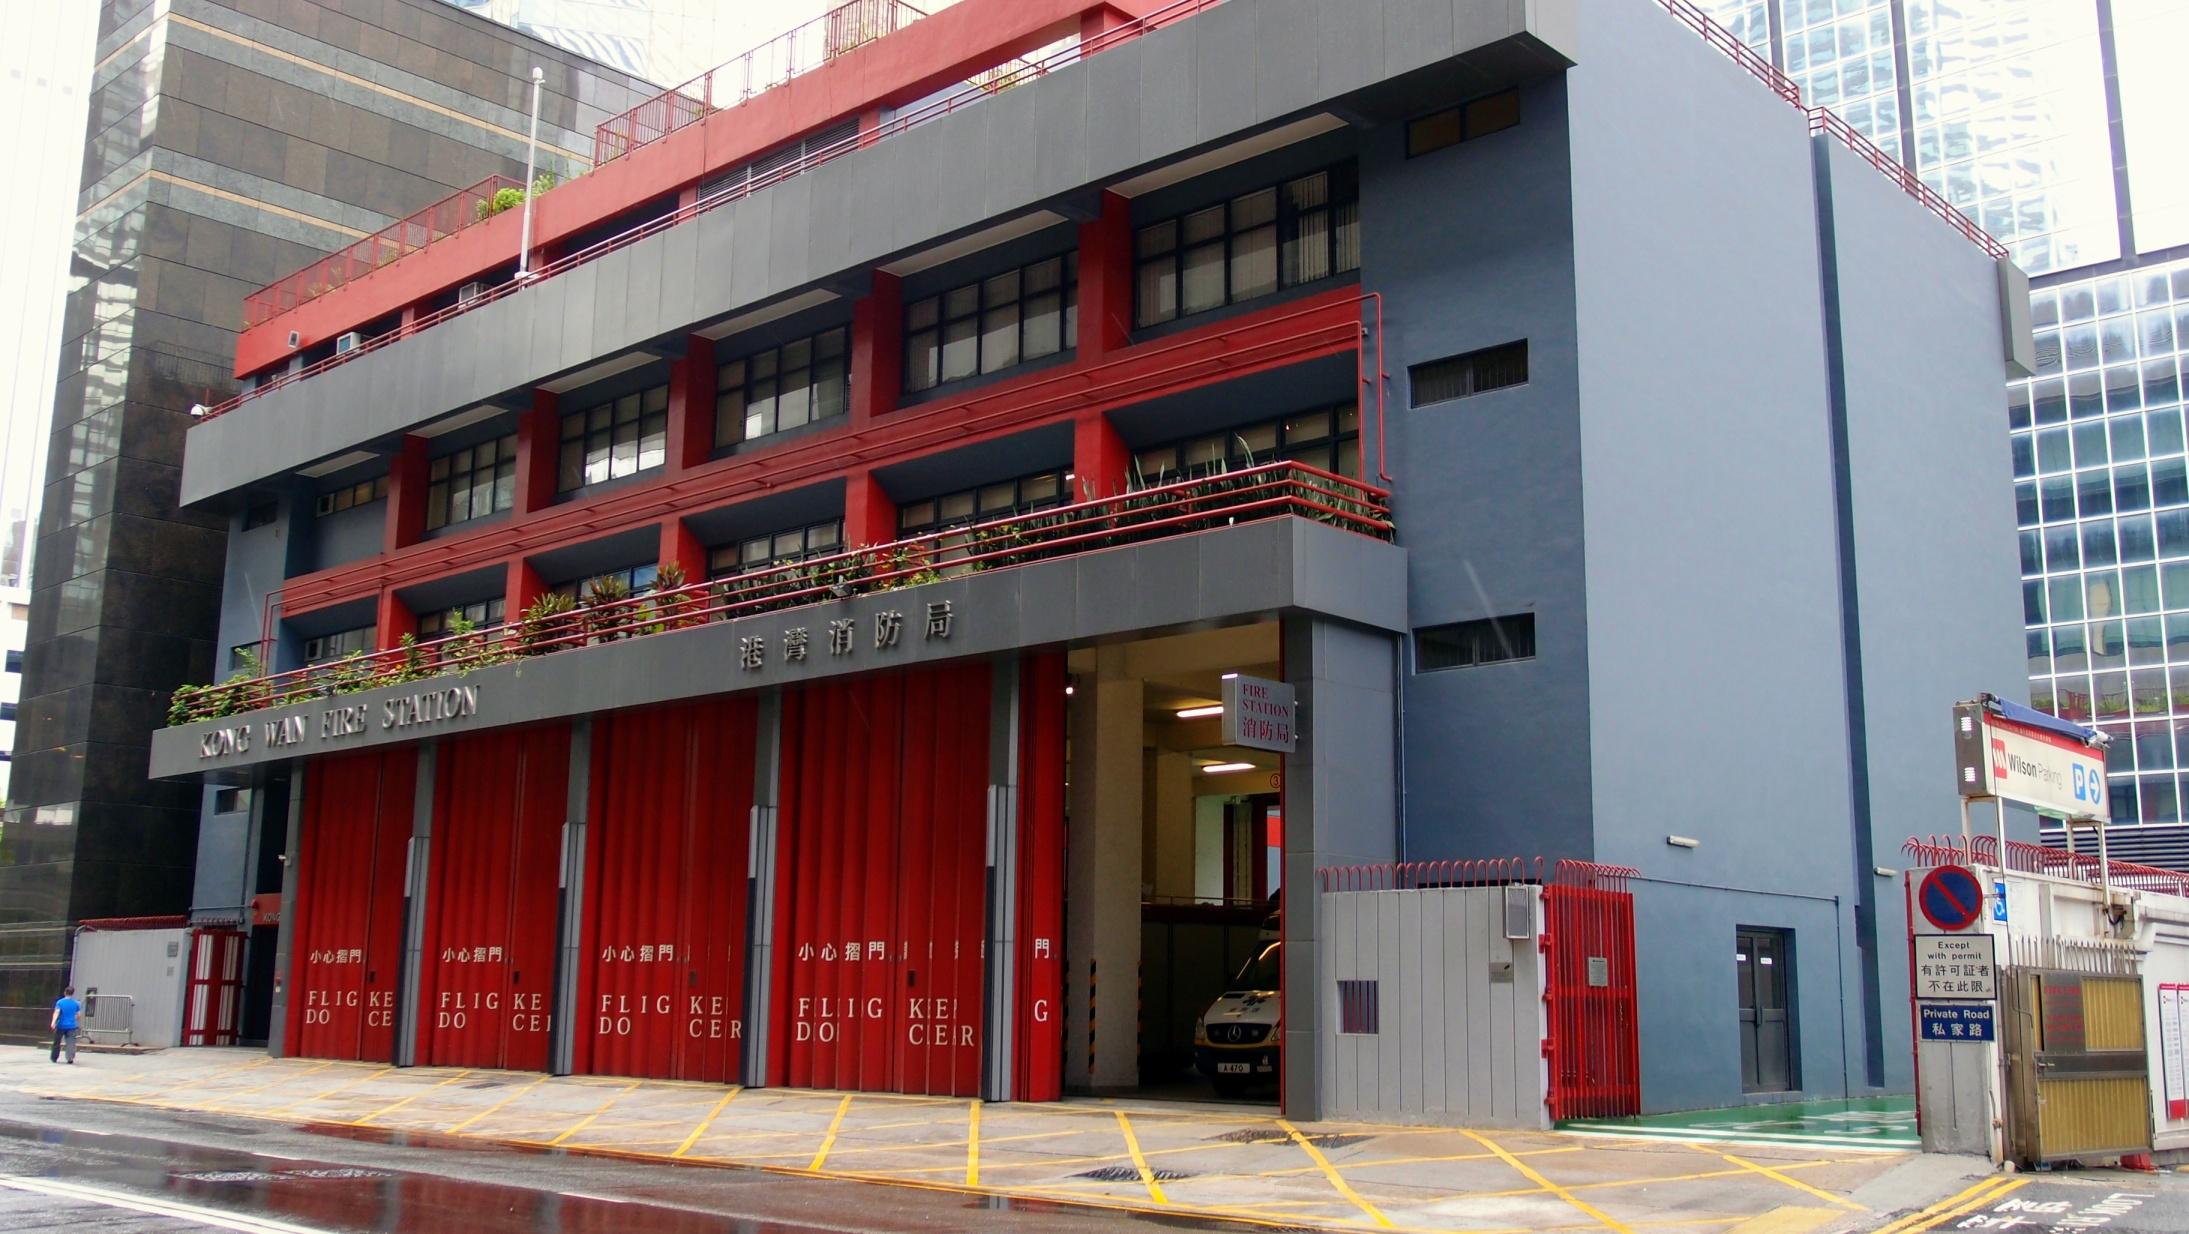 A fire station.